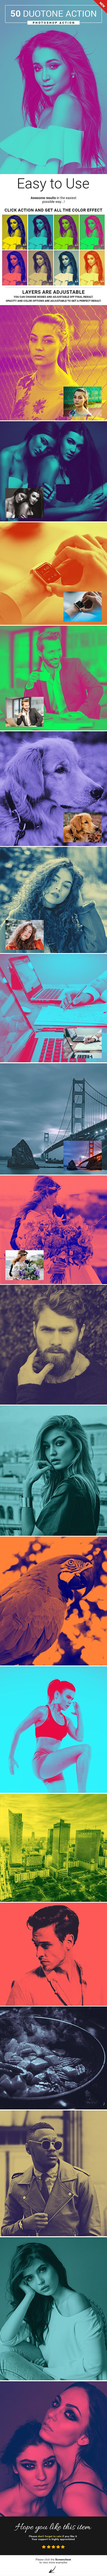 Invents - 50+ Duotone Photoshop Action - Actions Photoshop